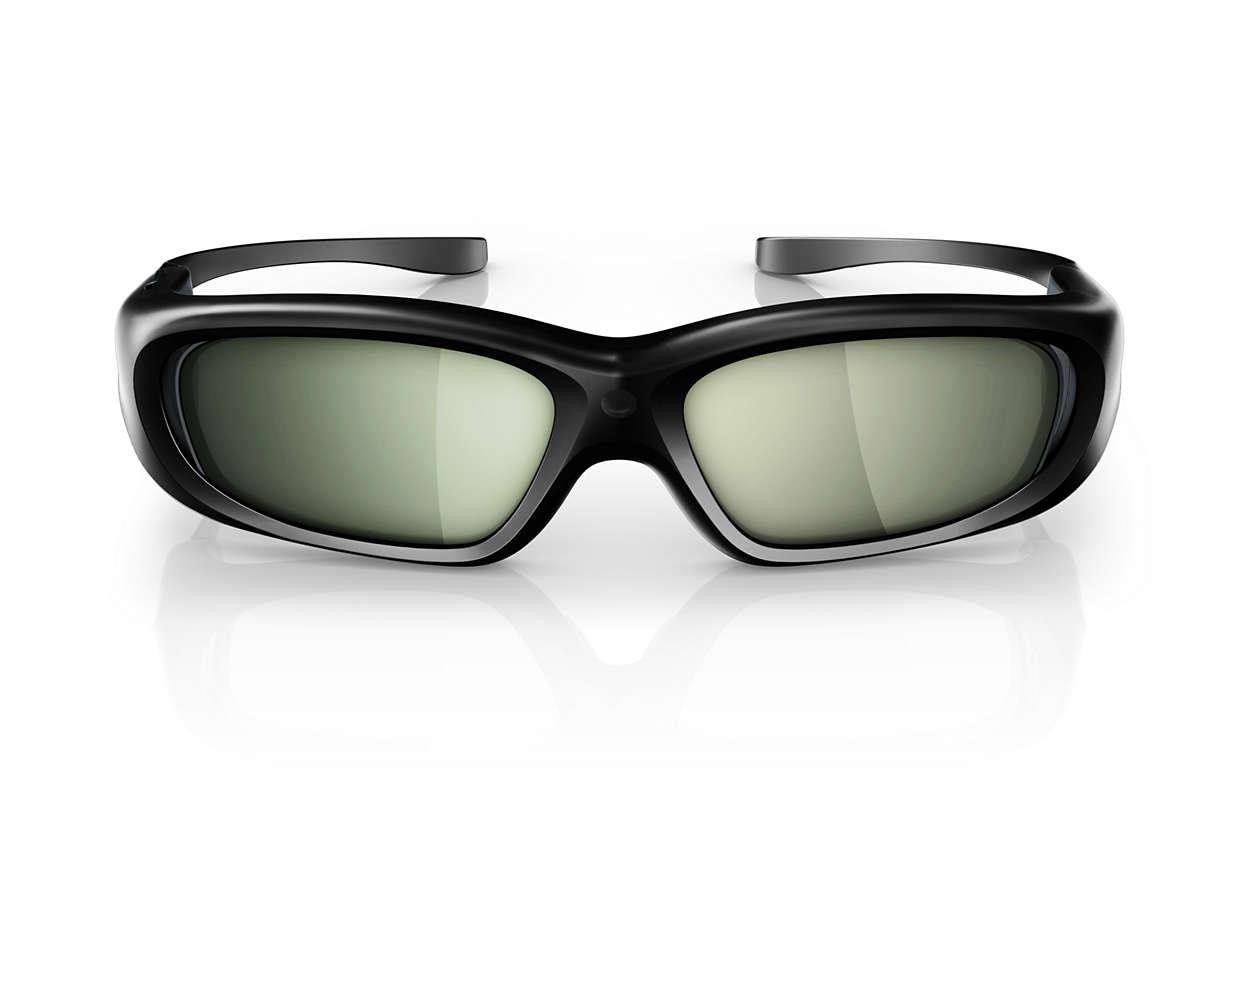 lunettes 3d active pta508 00 philips. Black Bedroom Furniture Sets. Home Design Ideas